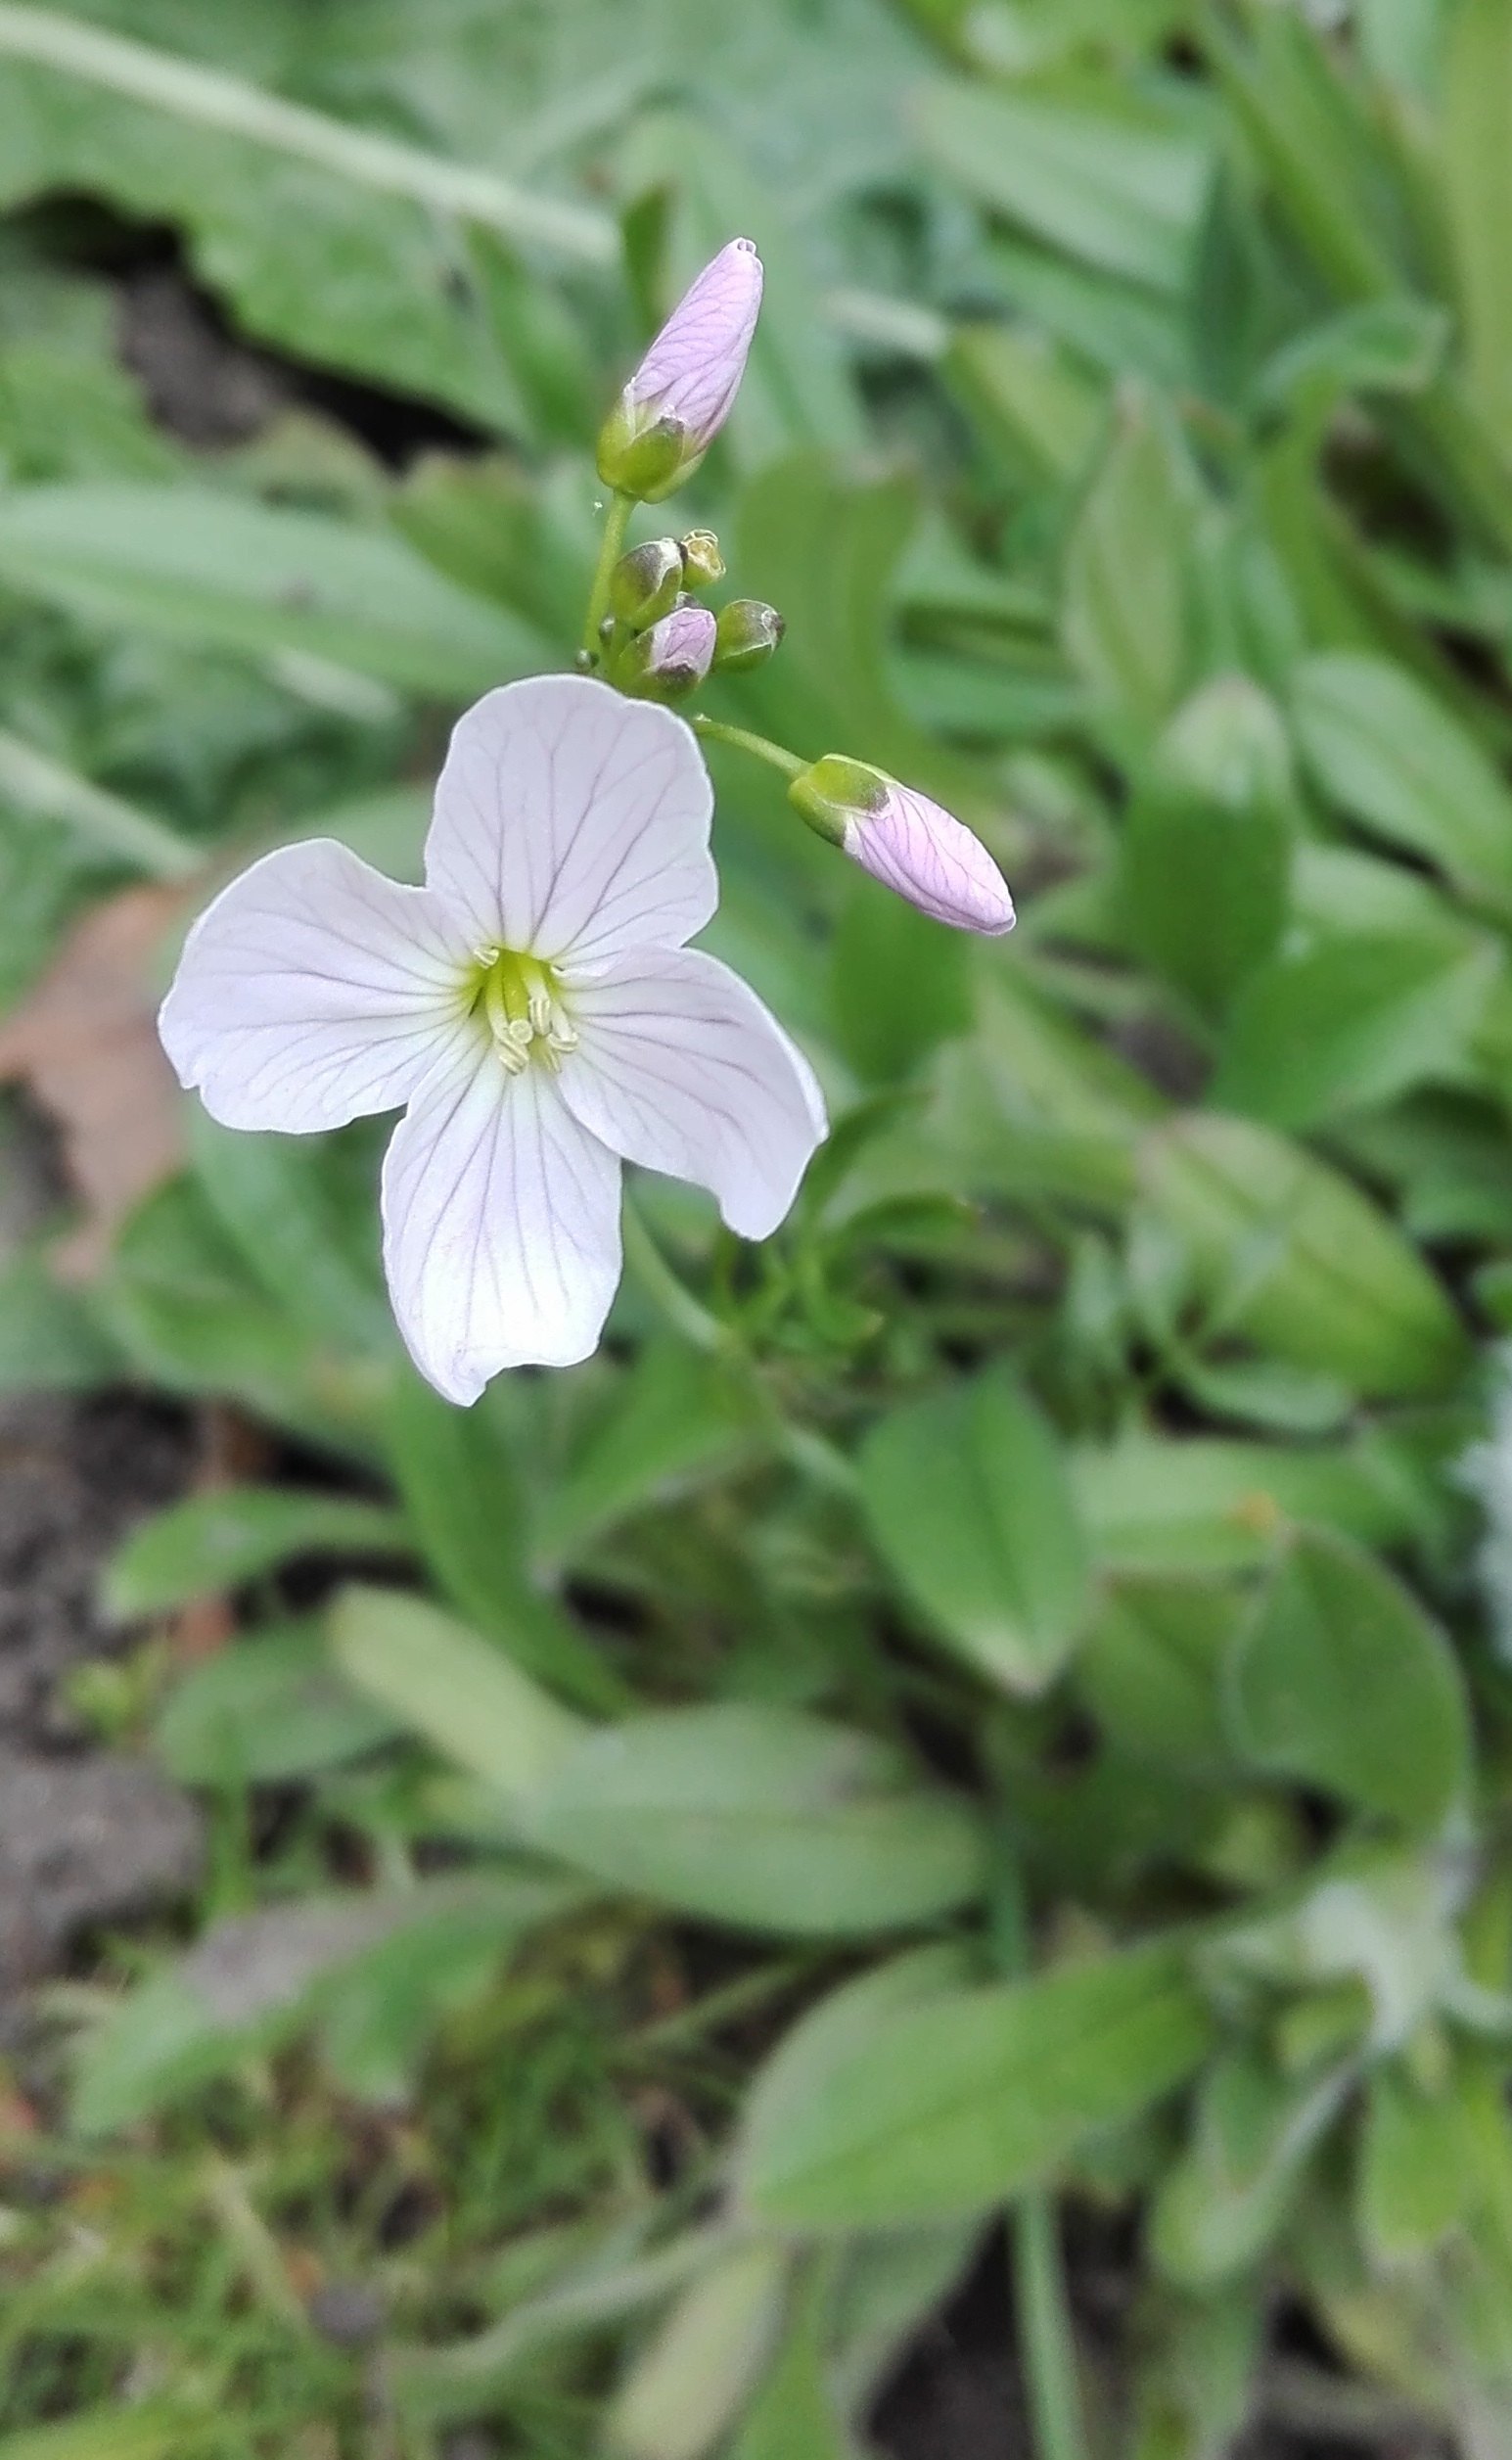 #453 Cuckoo Flower (Cardamine pratensis)